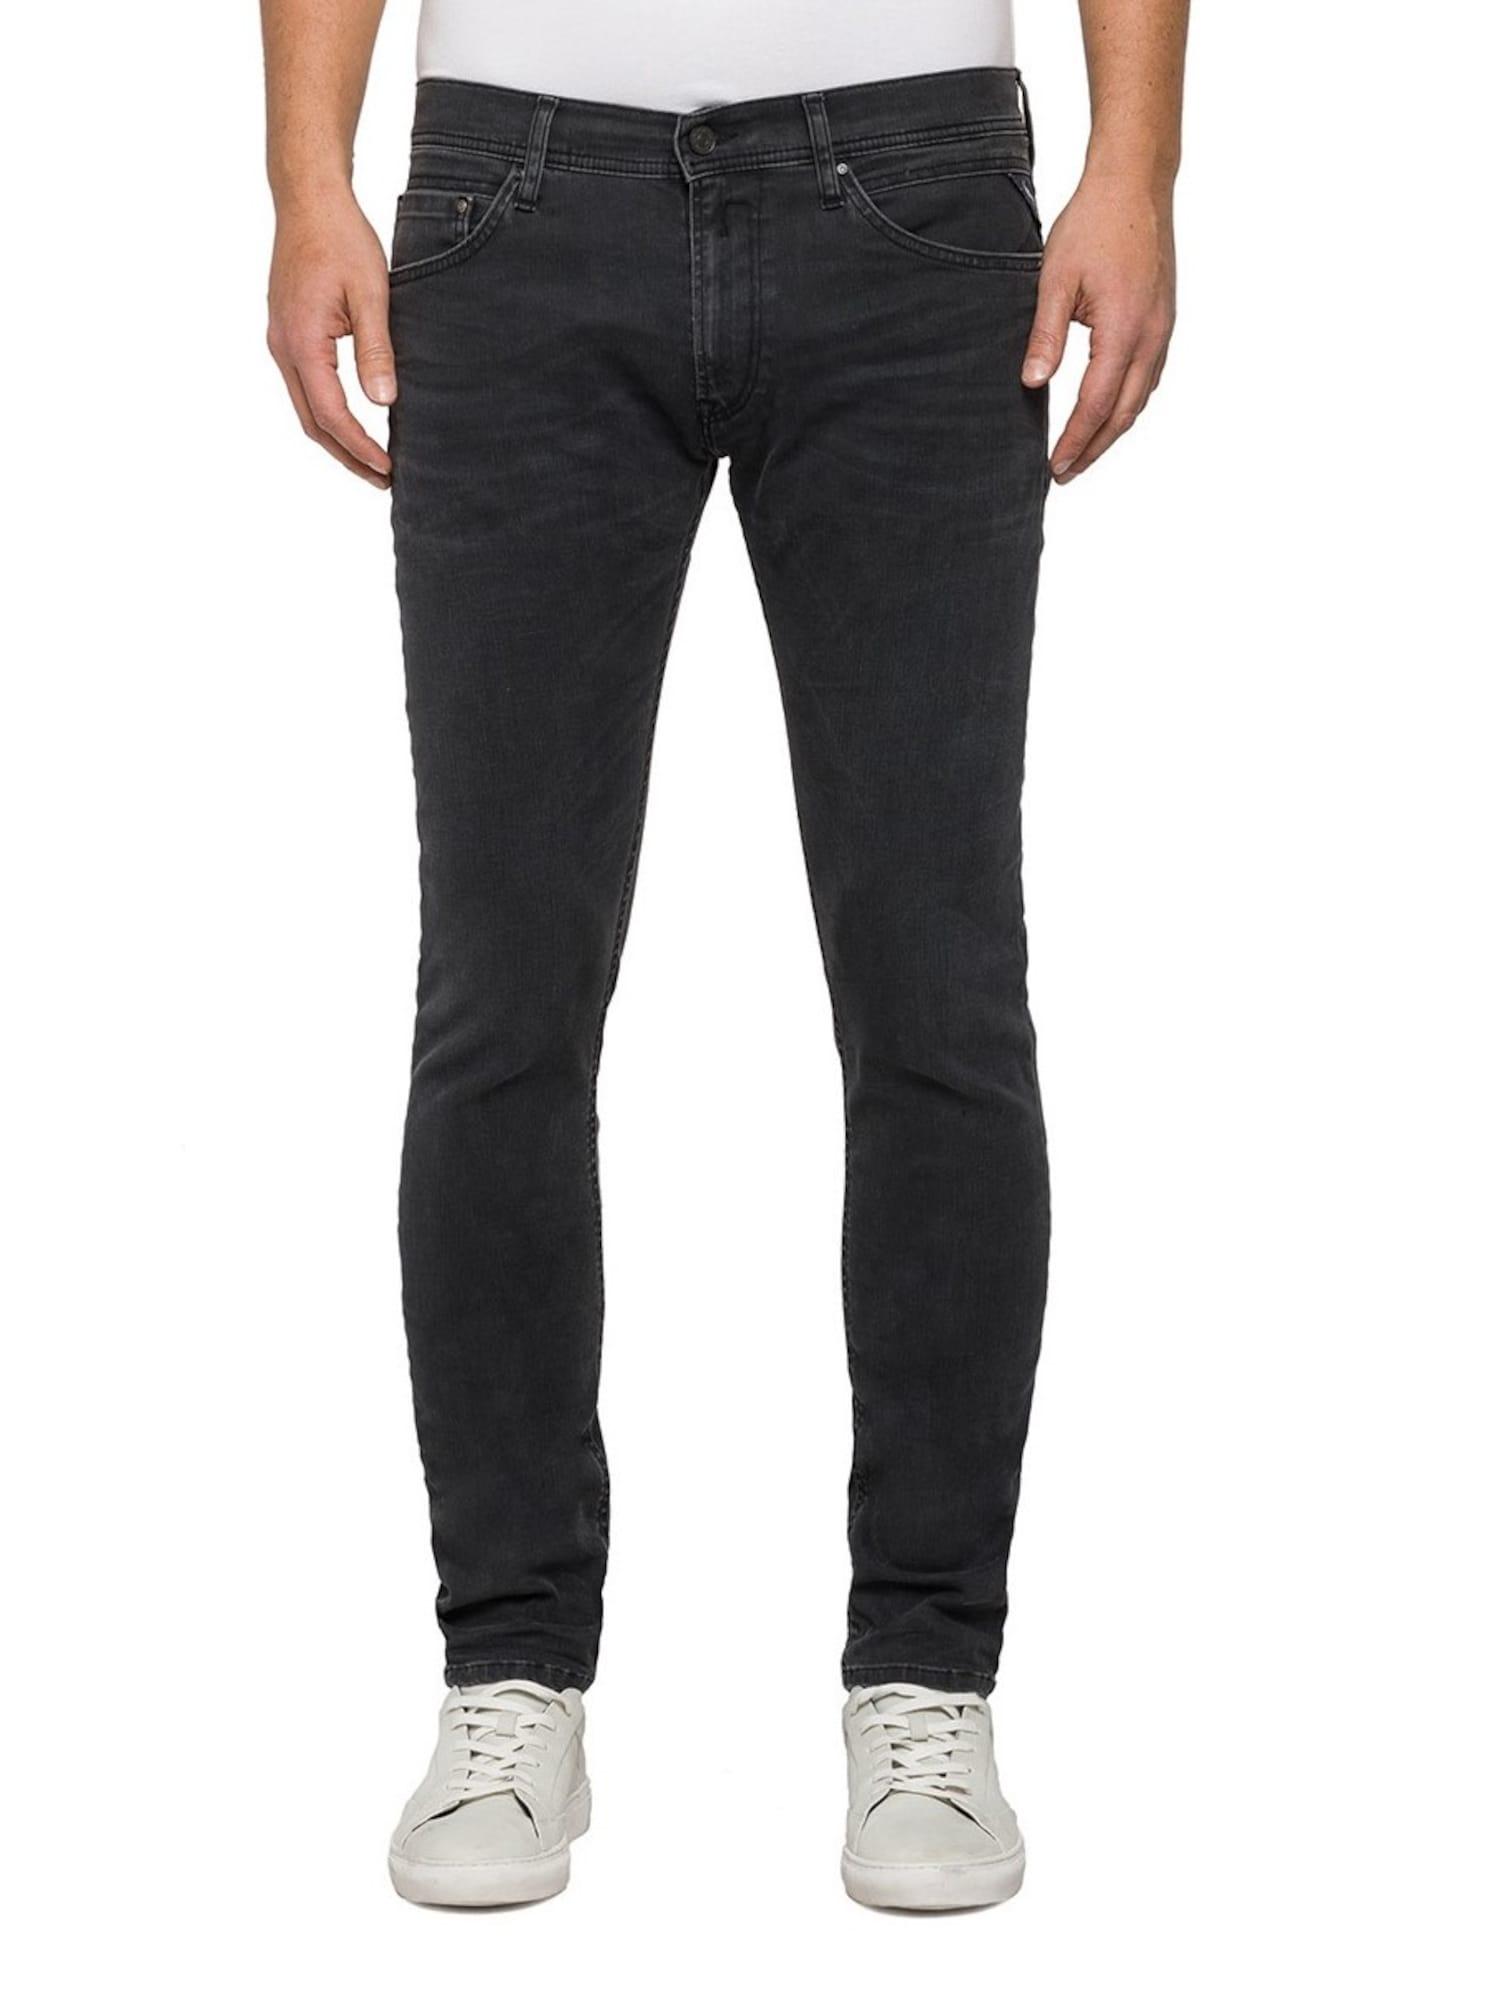 REPLAY Heren Jeans zwart black denim